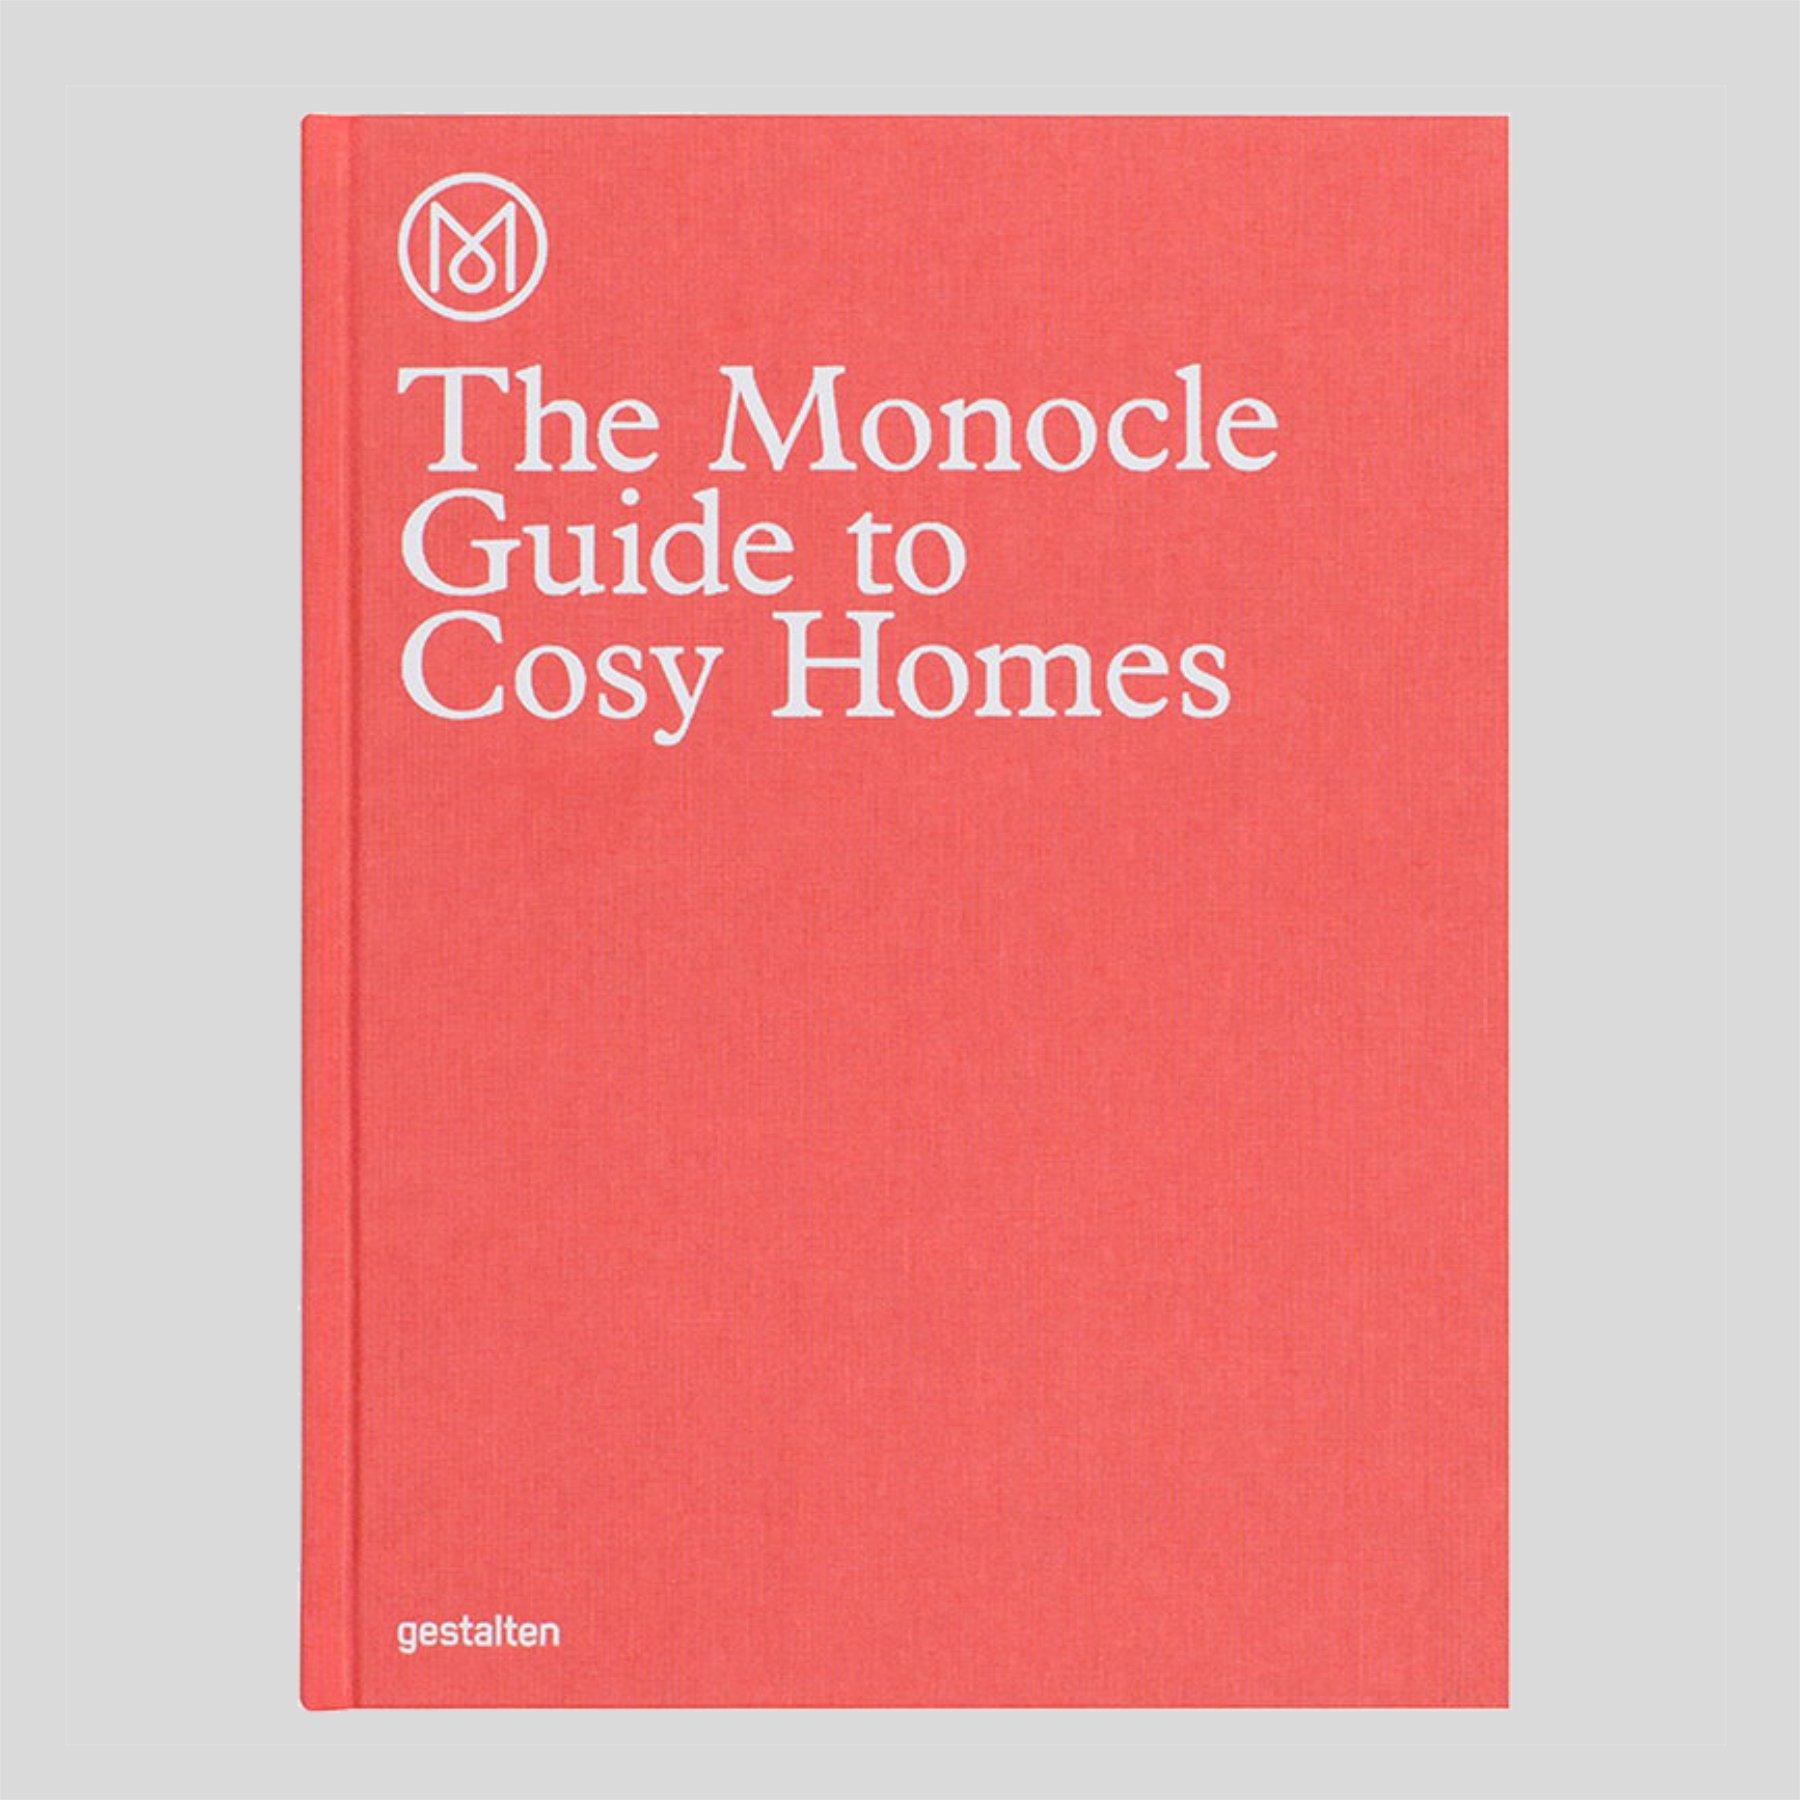 cosyhomes nordic interior book home